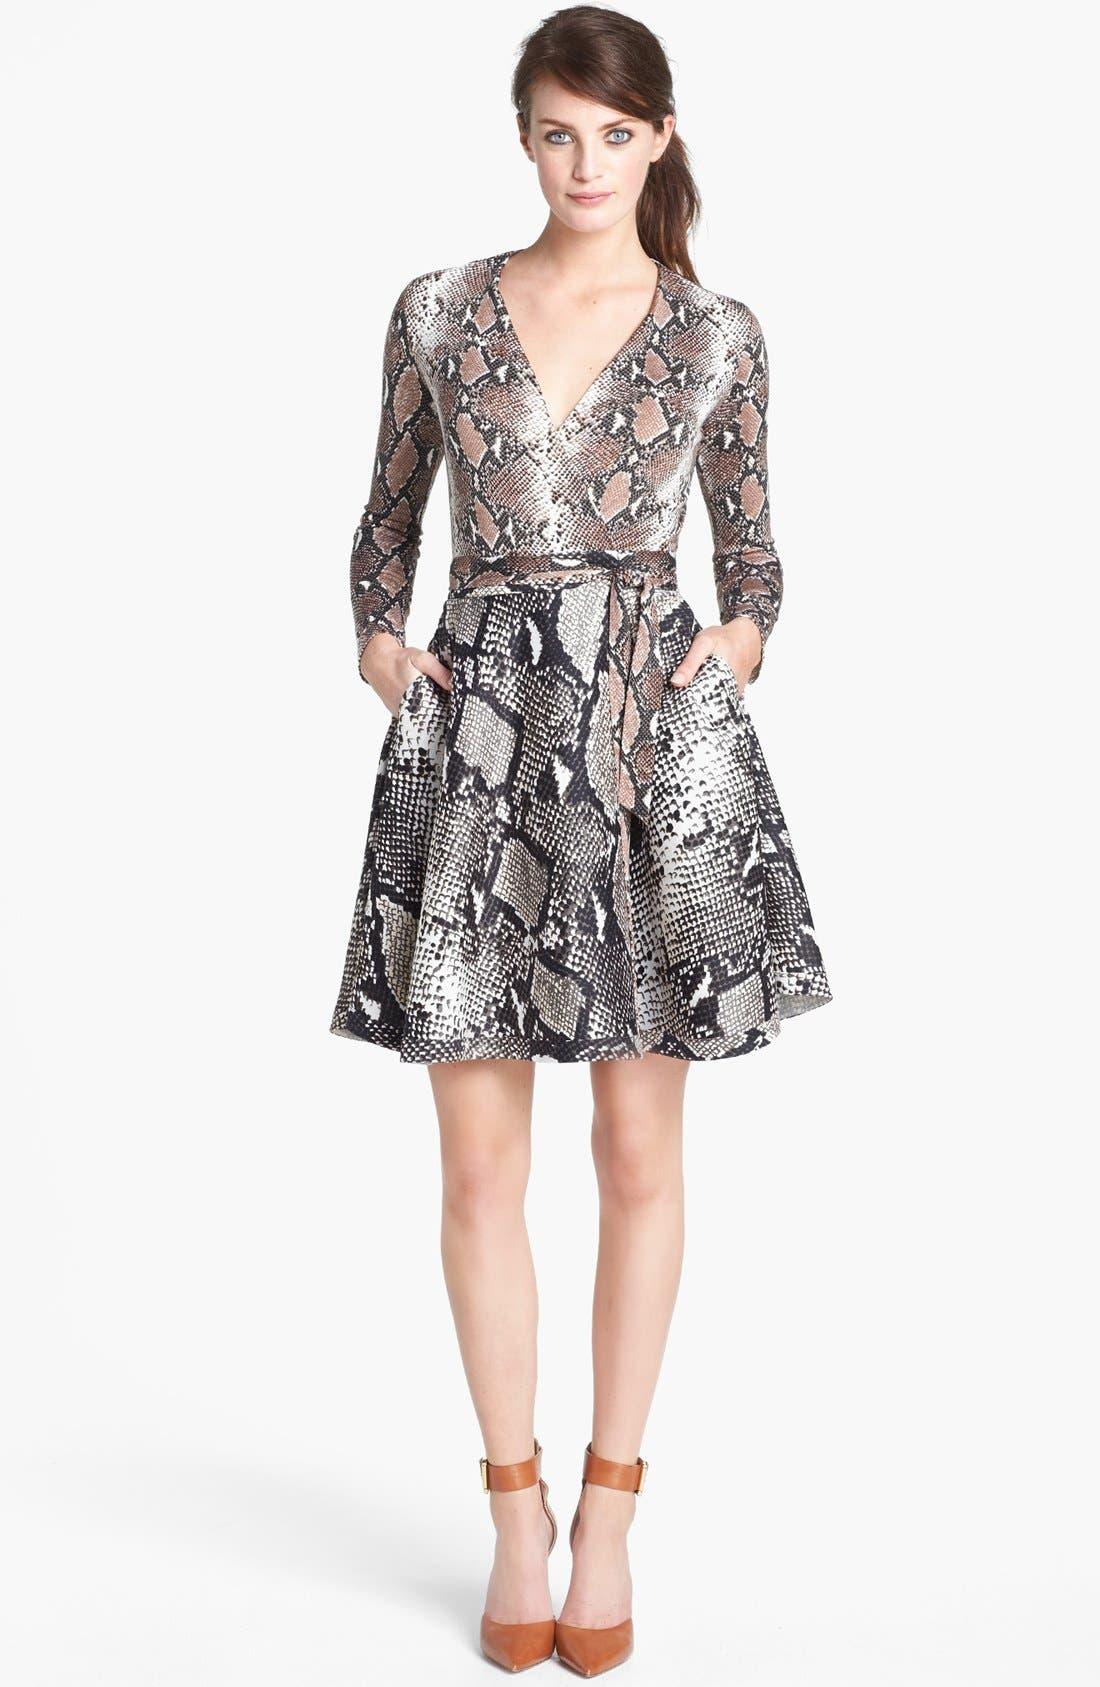 Main Image - Diane von Furstenberg 'Amelia' Knit Silk Wrap Dress